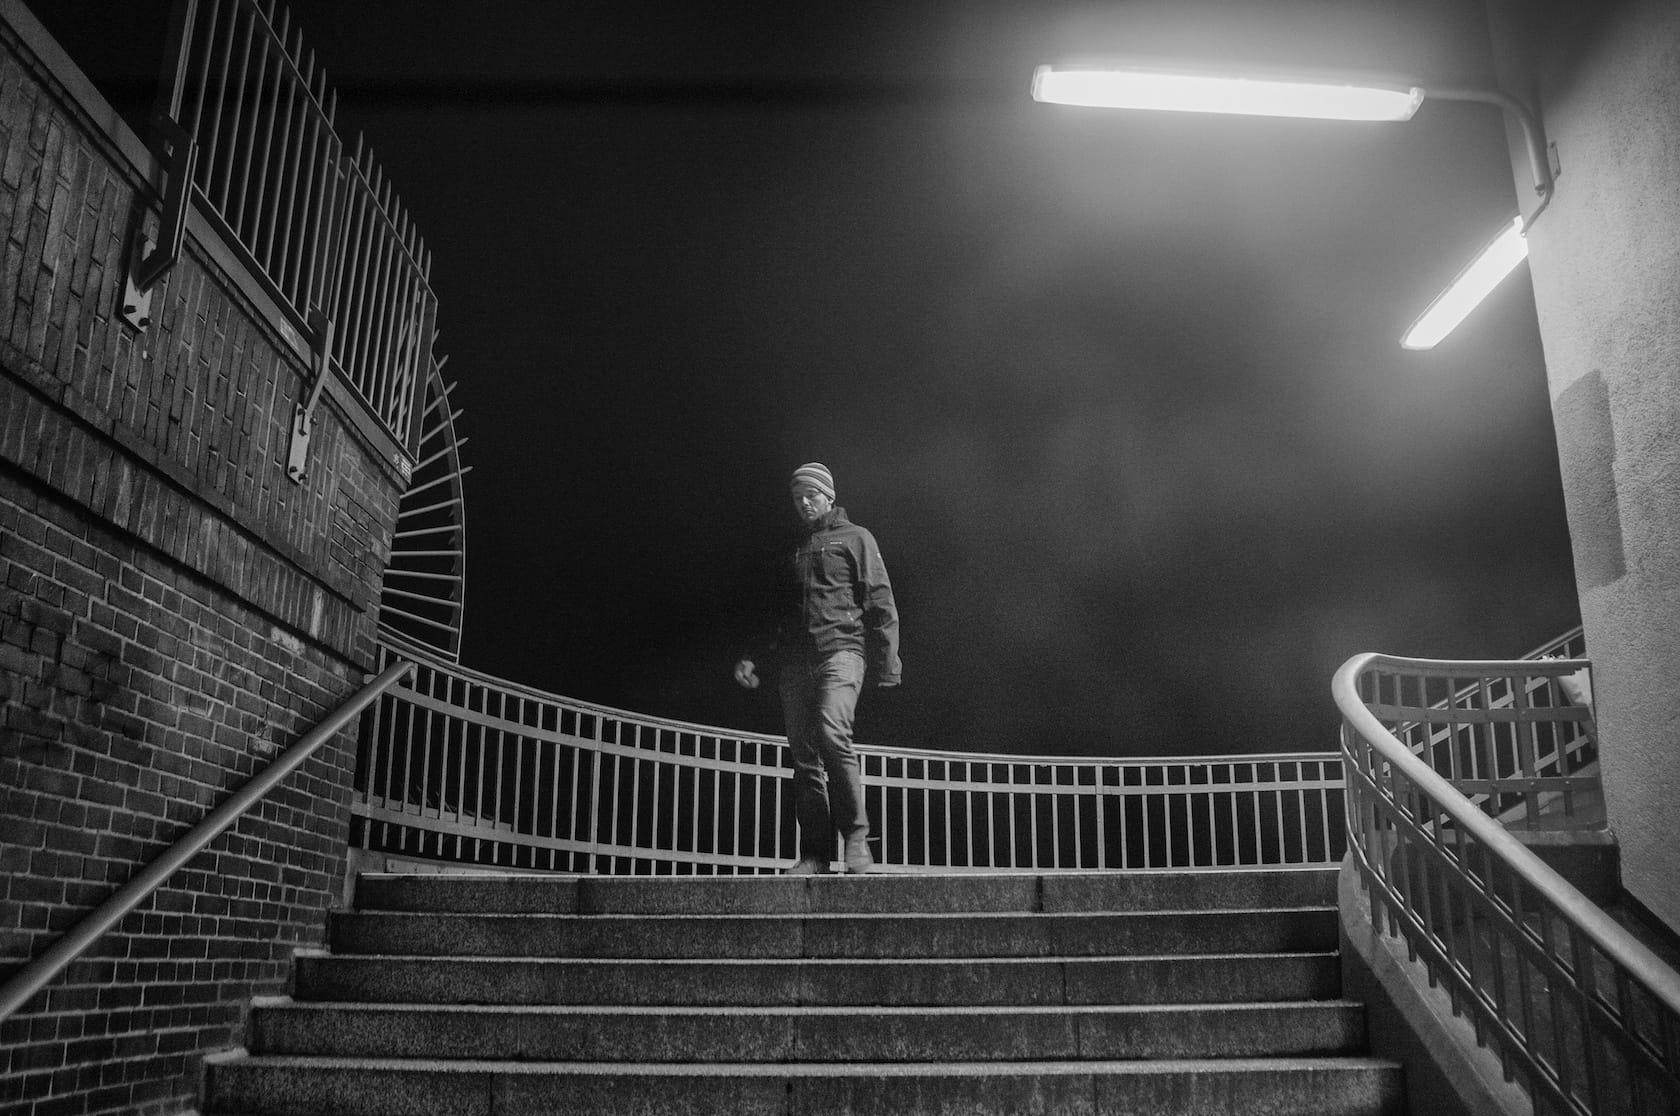 Man climbing down stairs